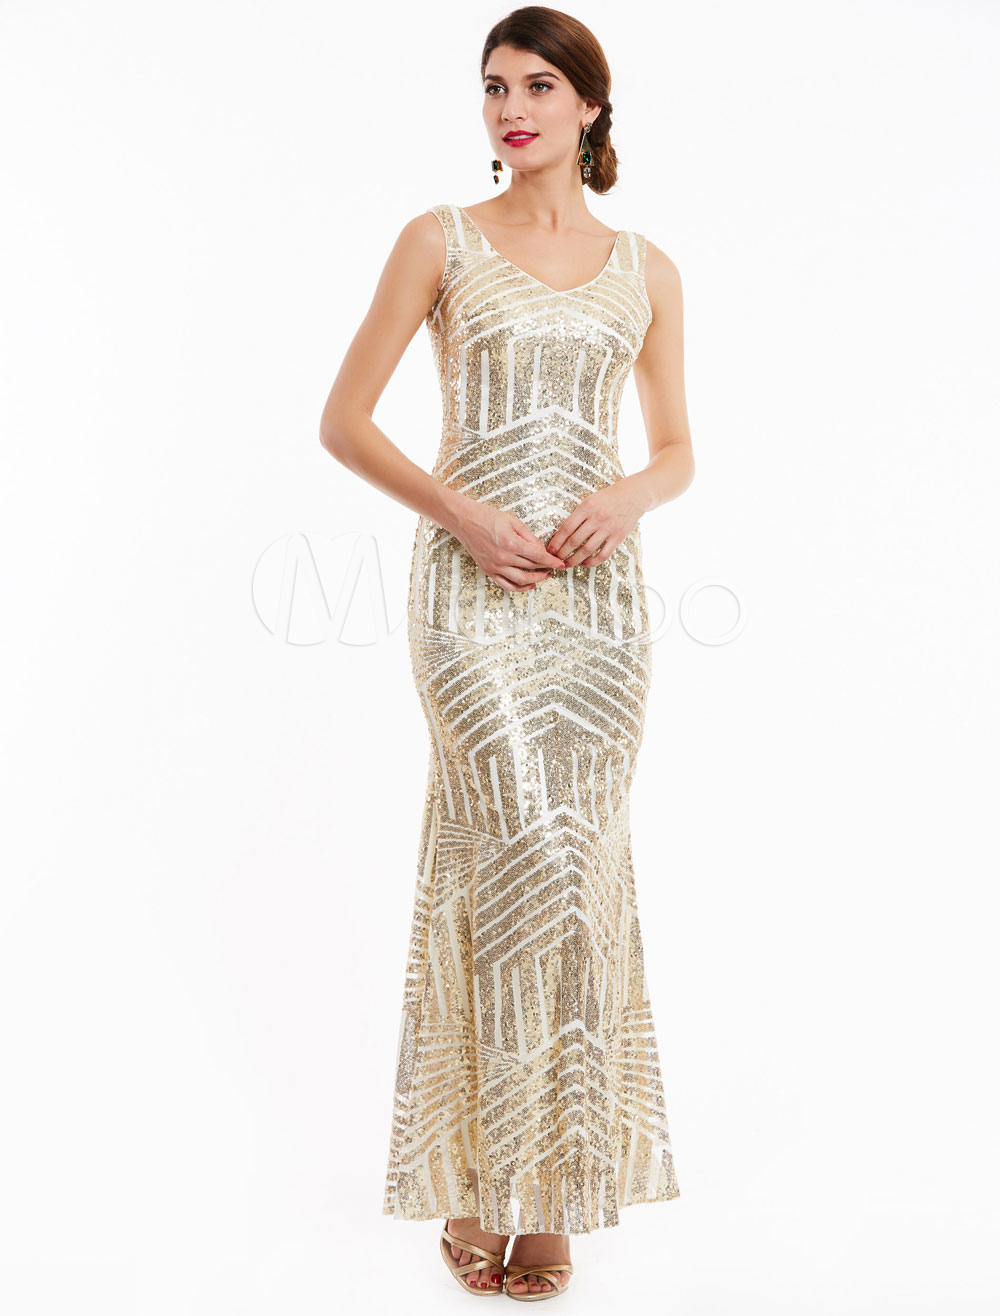 Sequin Evening Dresses Mermaid V Neck Backless Light Gold Formal ...